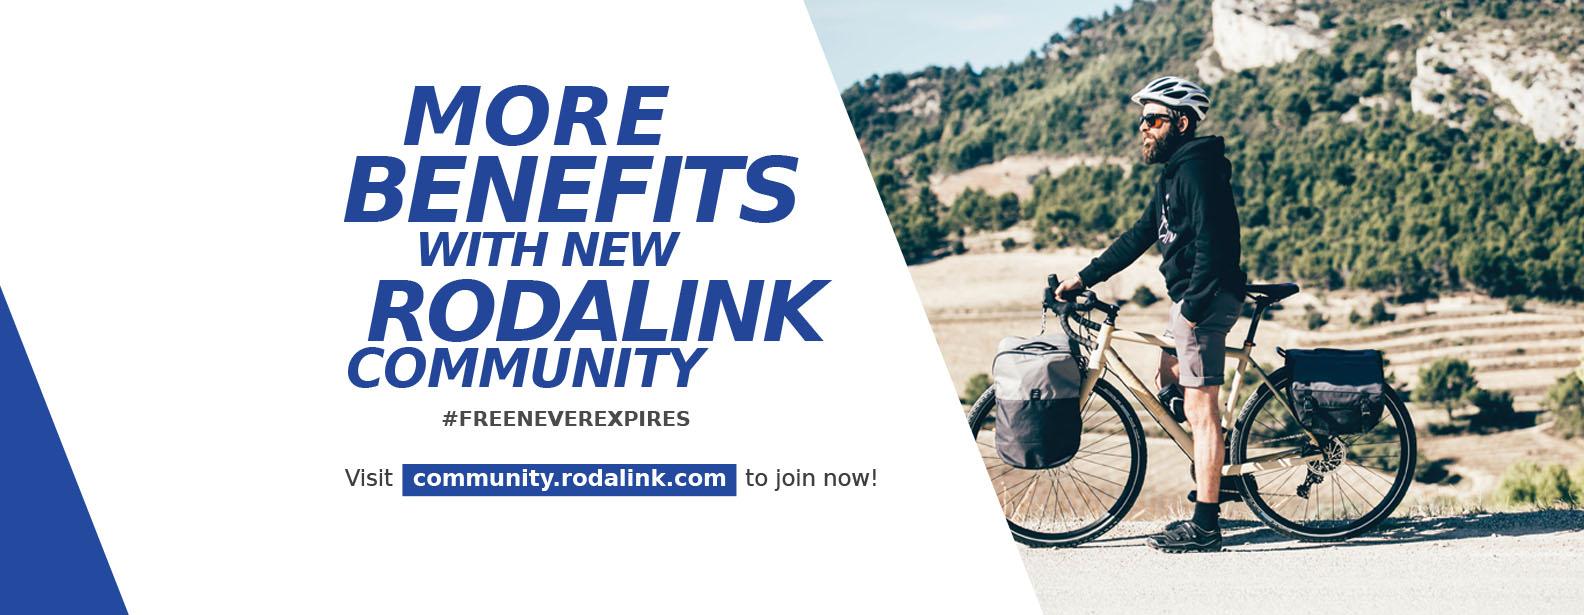 Rodalink Community